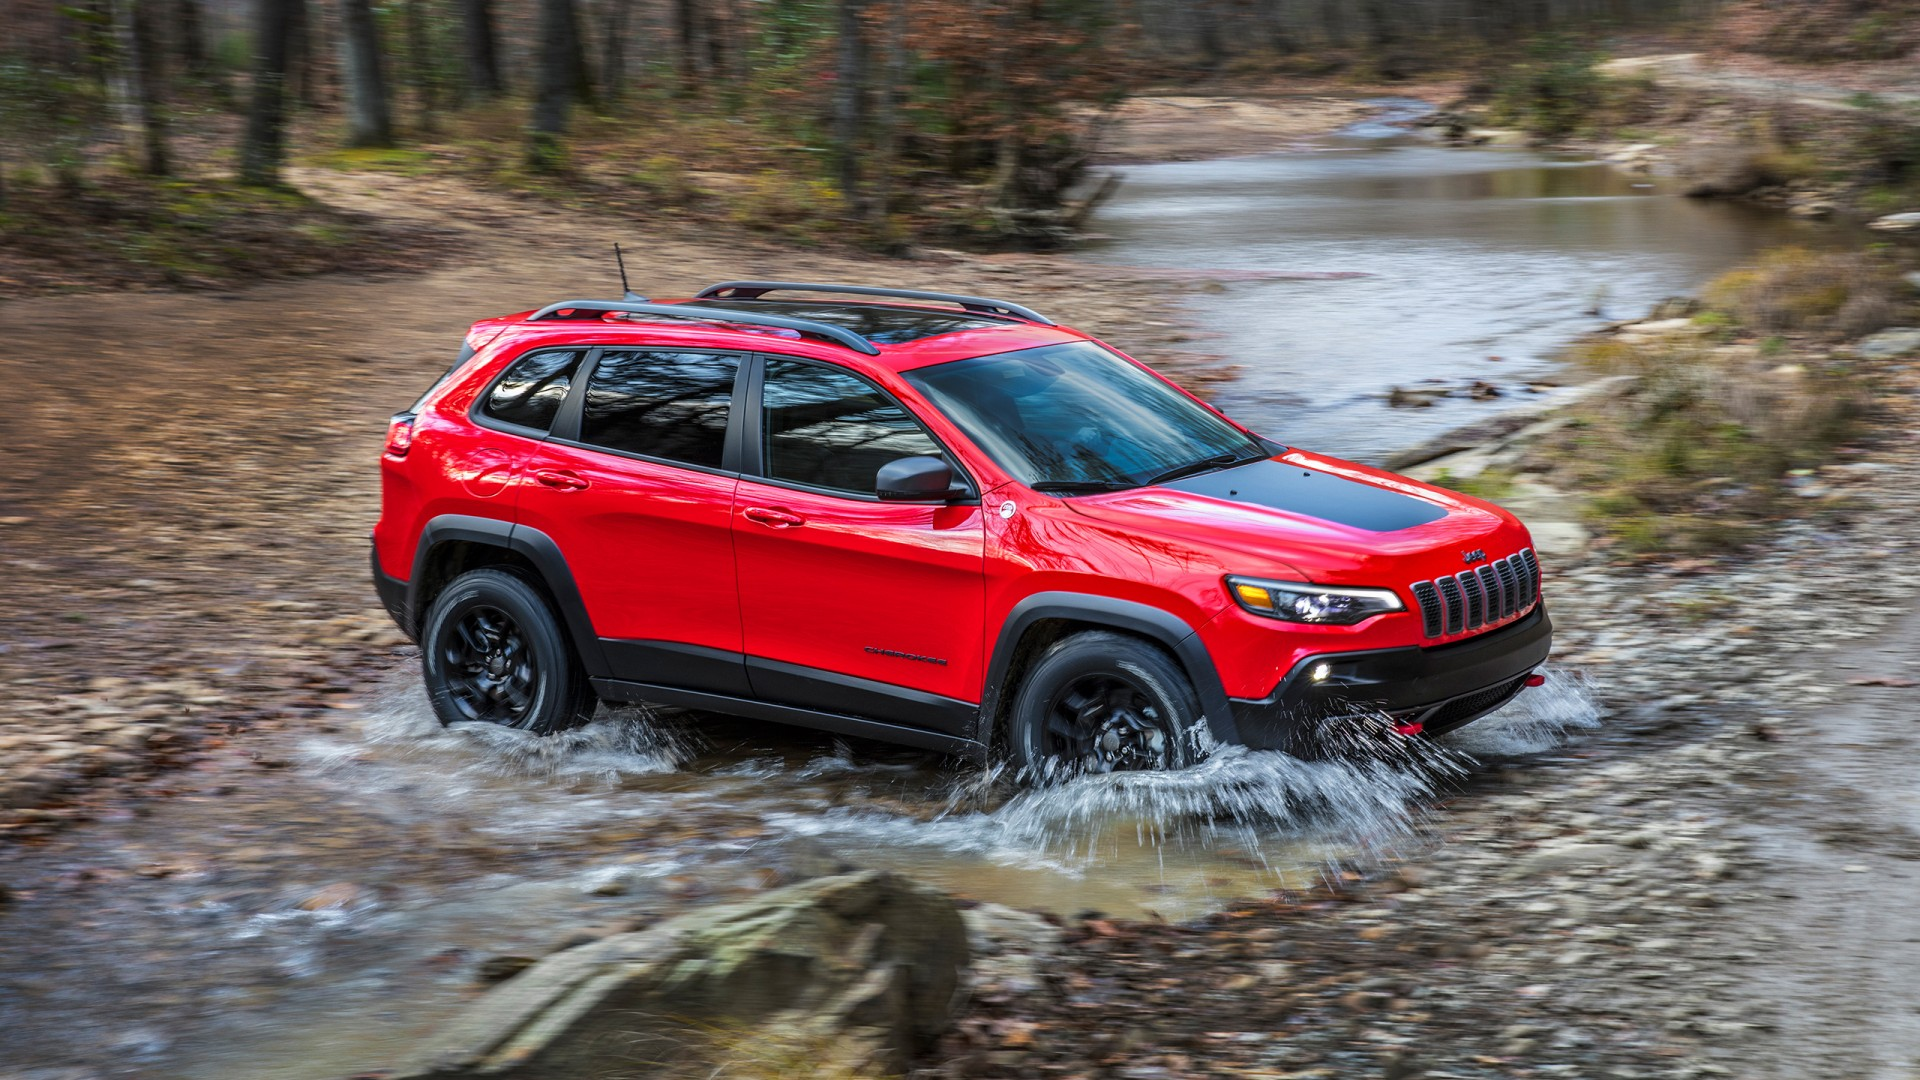 2019 Jeep Cherokee Trailhawk 2 Wallpaper   HD Car ...